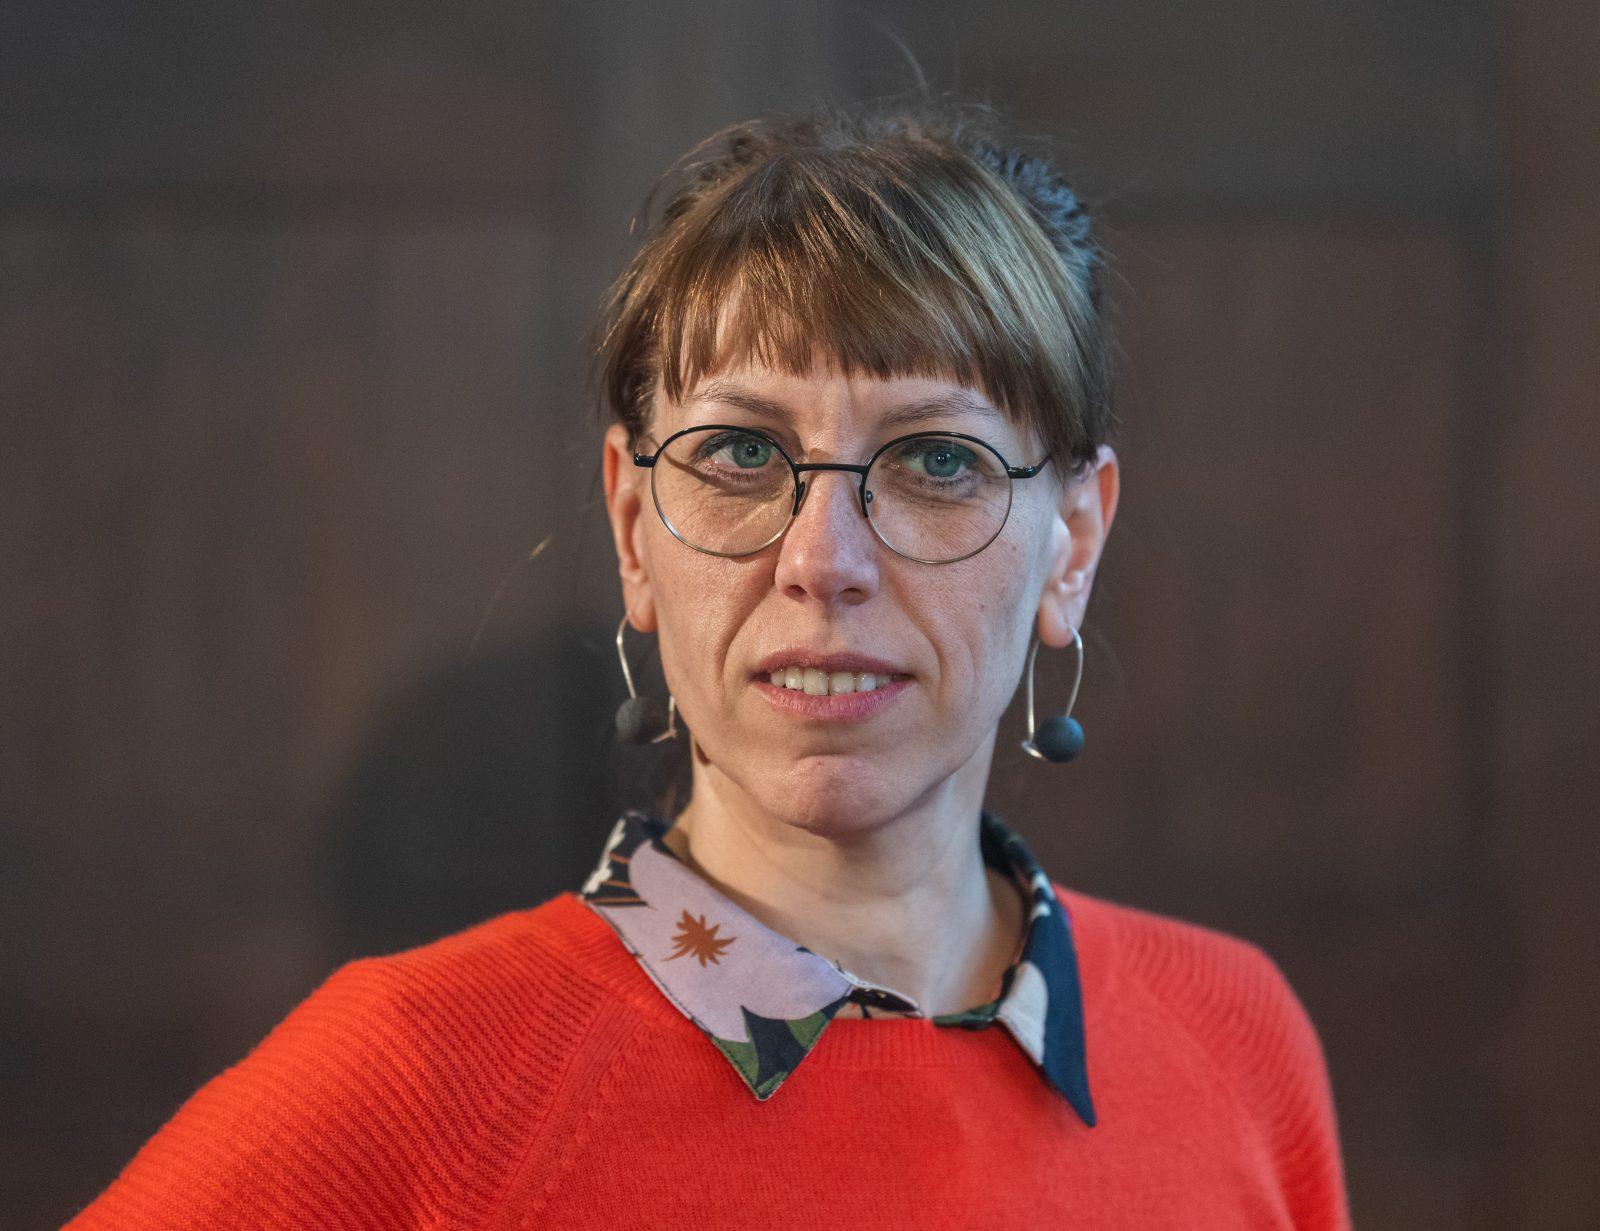 Sachsens Justizministerin Katja Meier (Grüne) gerät wegen der Personalpolitik ihres Ministeriums in die Kritik Foto: picture alliance/Robert Michael/dpa-Zentralbild/dpa